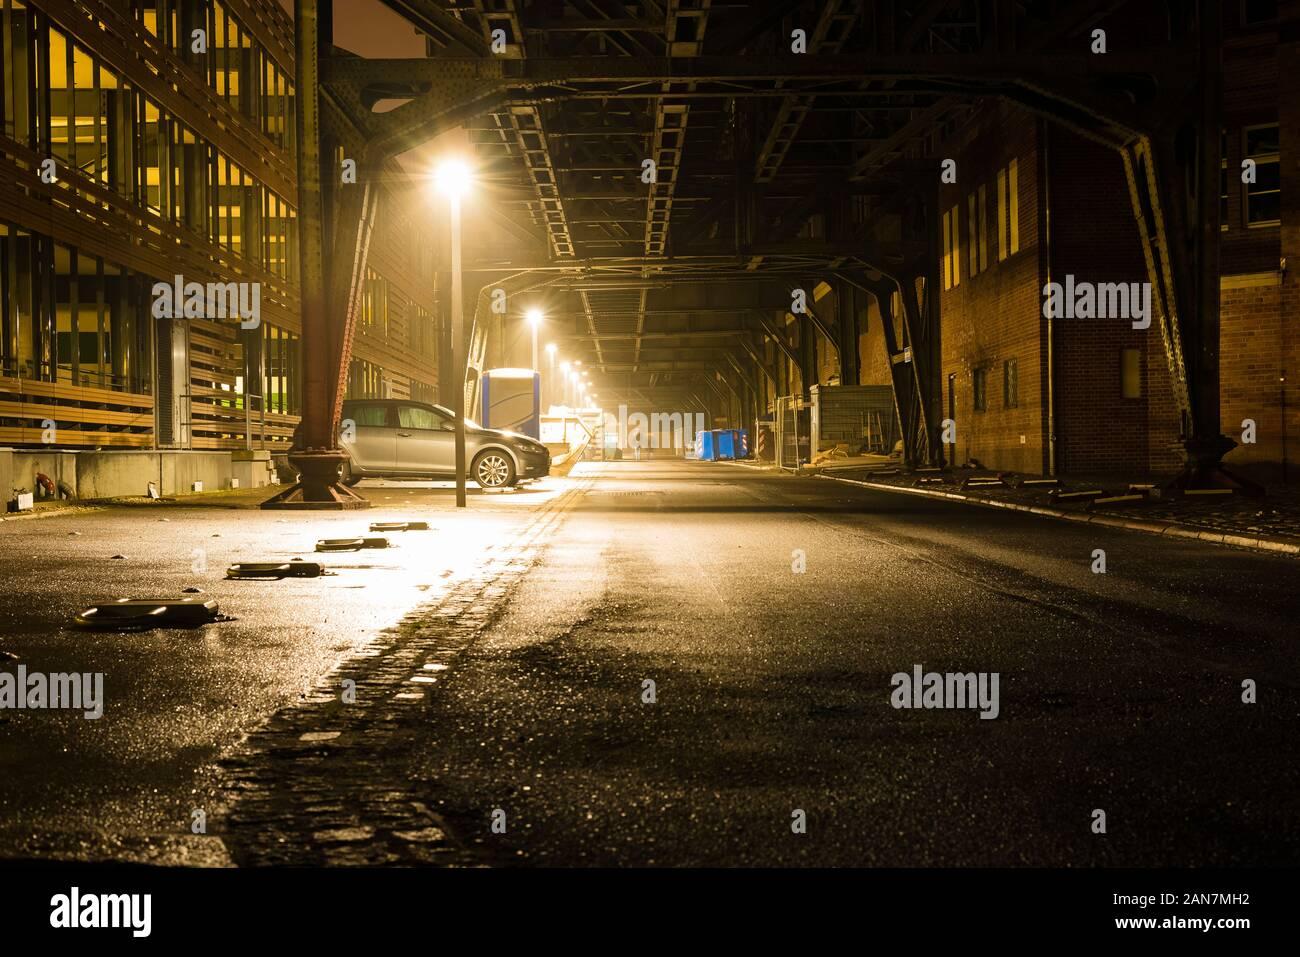 Old Bridge construction at night, berlin, gleisdreieck berlin at night, elevated railway in berlin, parking car, city lights, u-bahn, underground Stock Photo